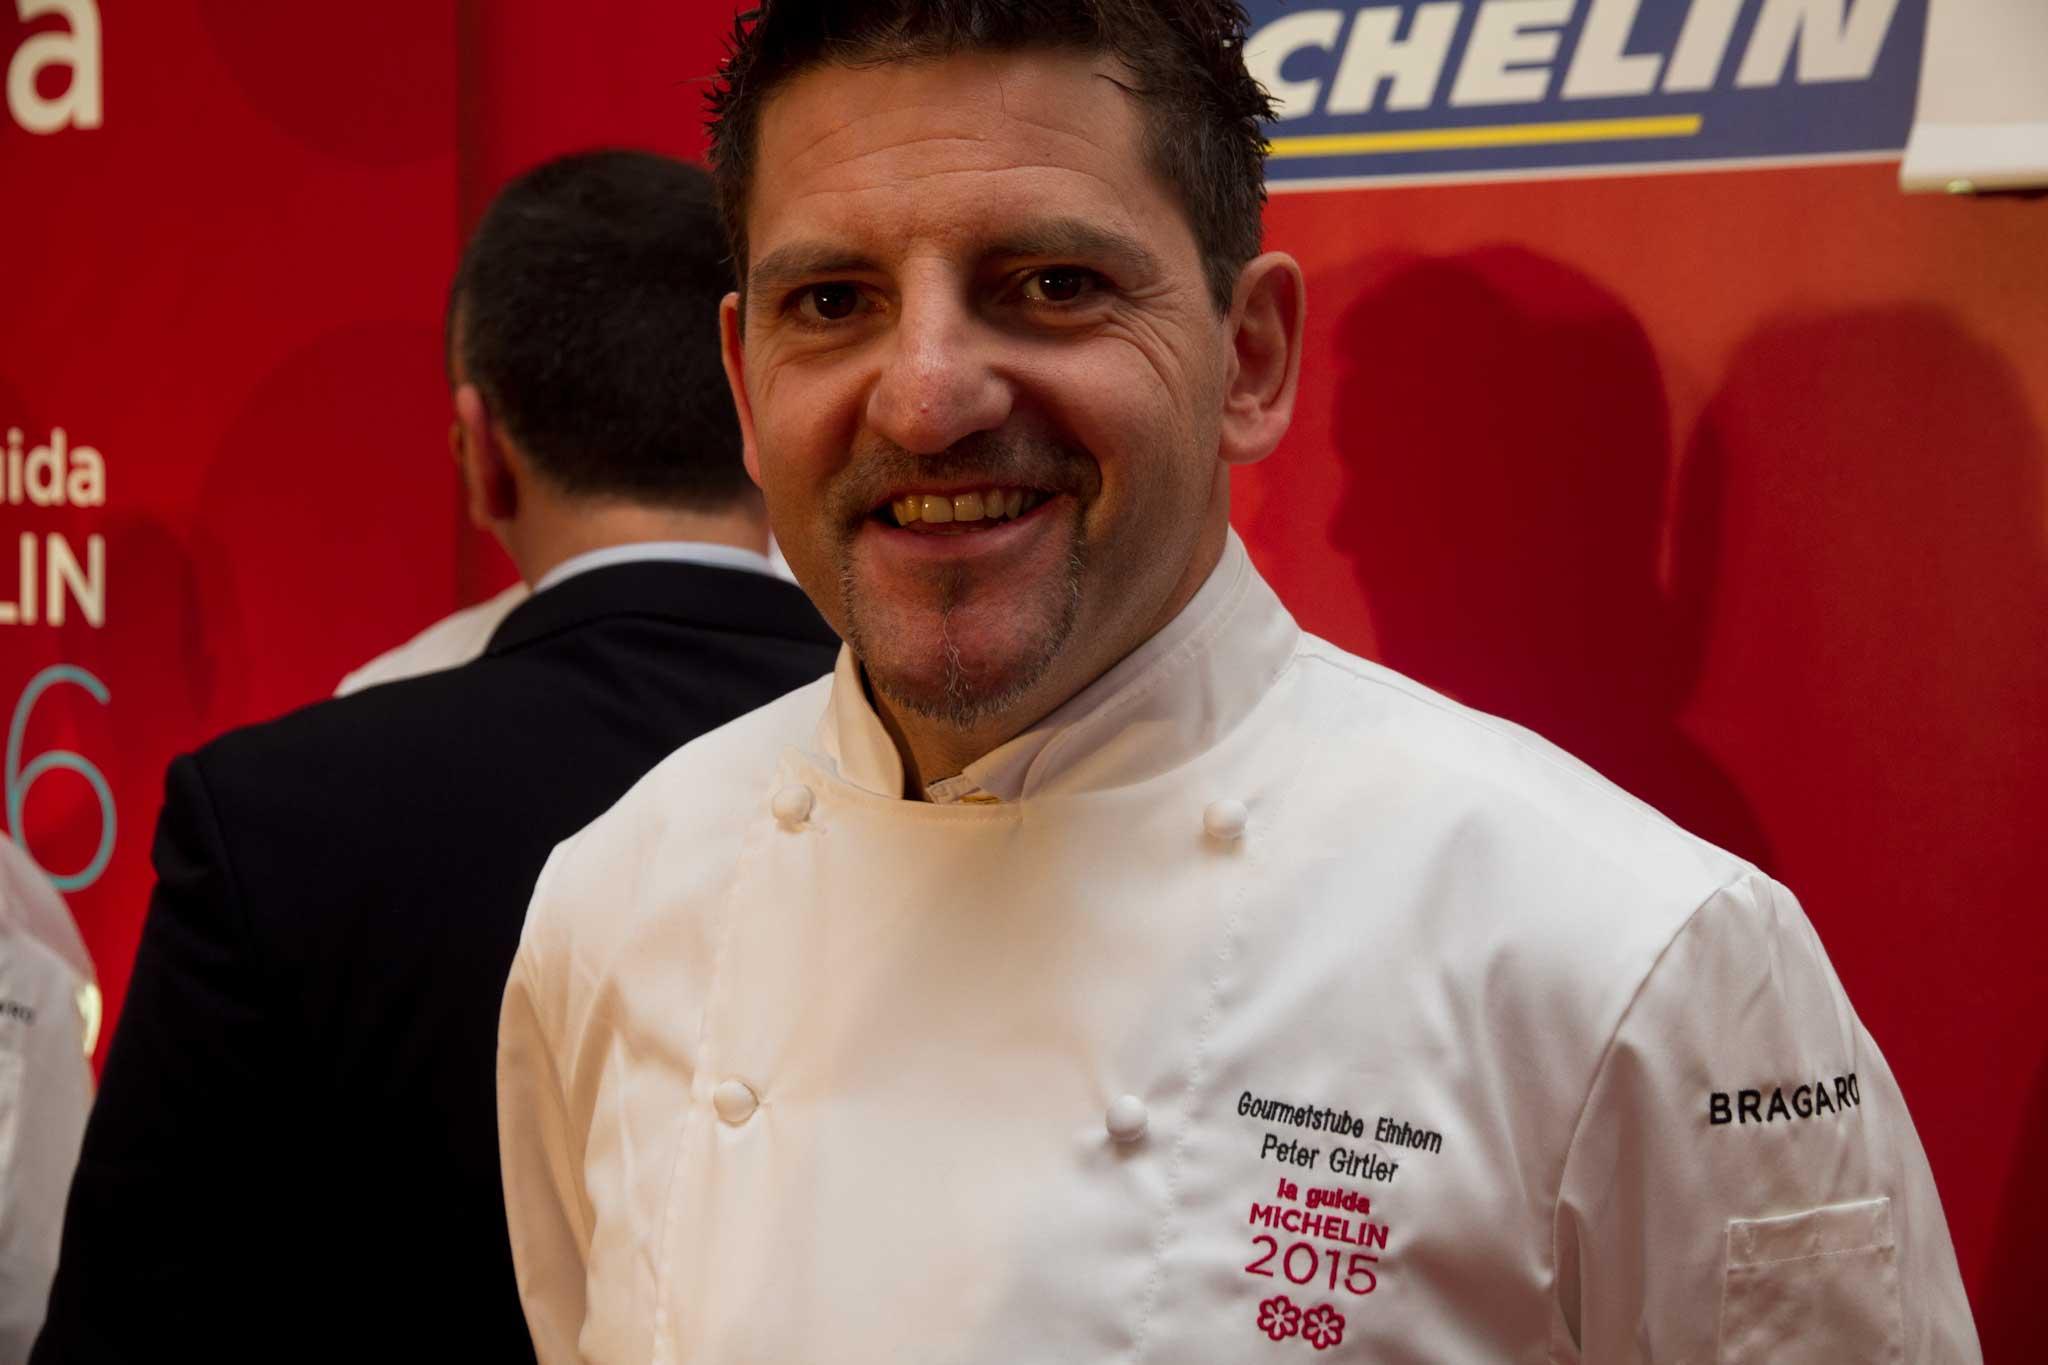 Peter Girtler chef